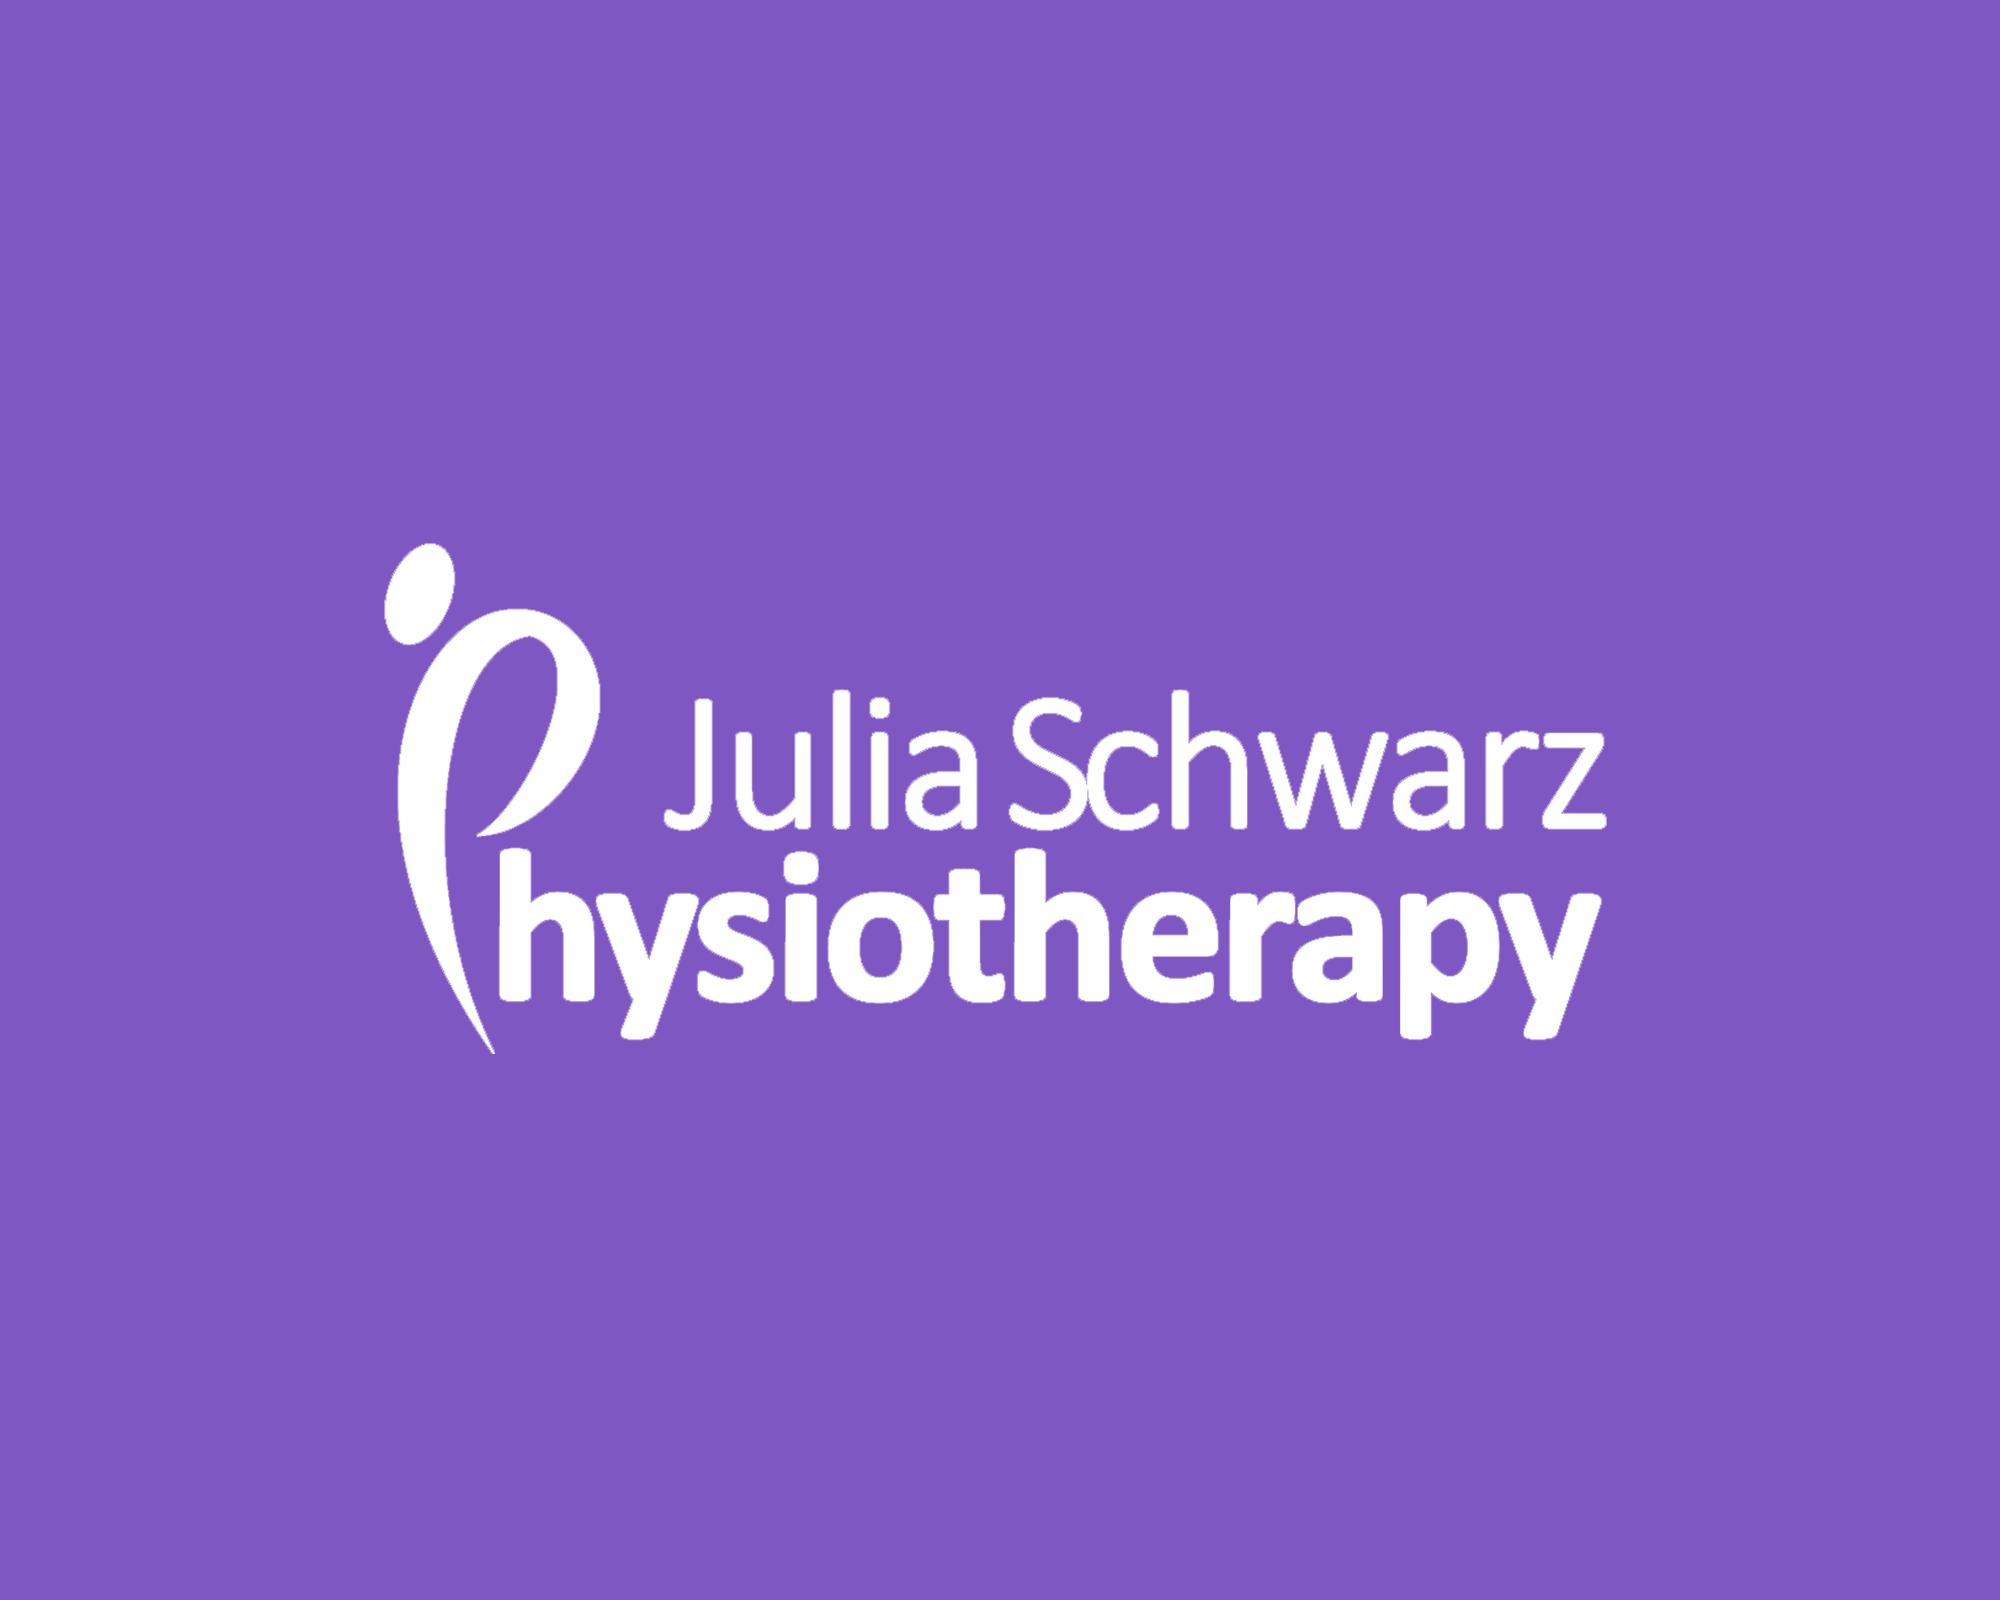 julia schwarz physiotherapy Logo